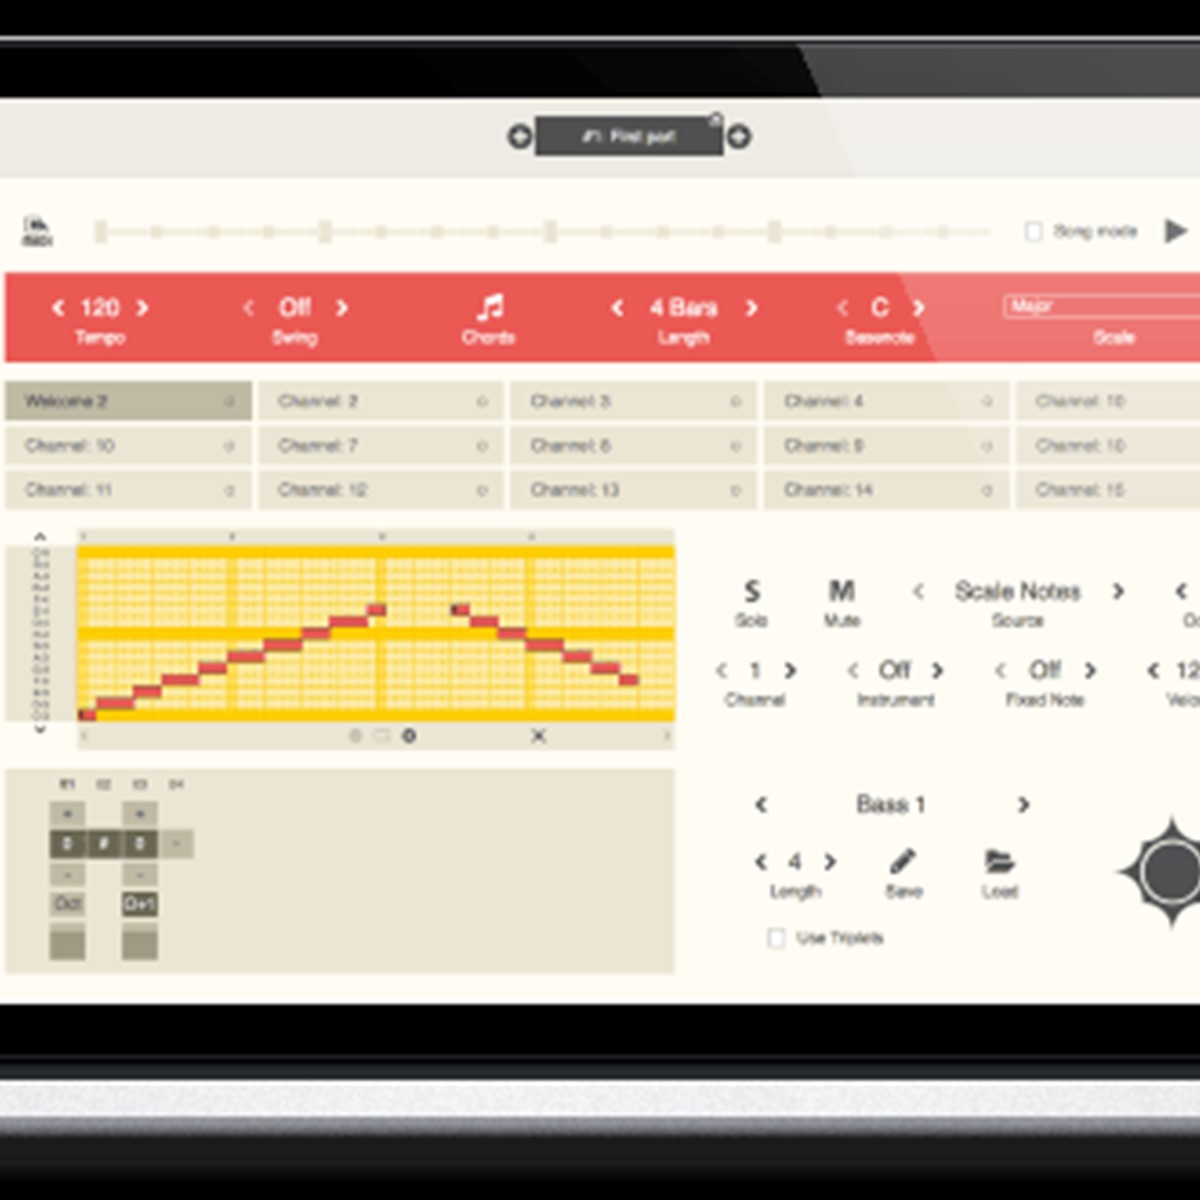 Sundog Song Studio Alternatives and Similar Software